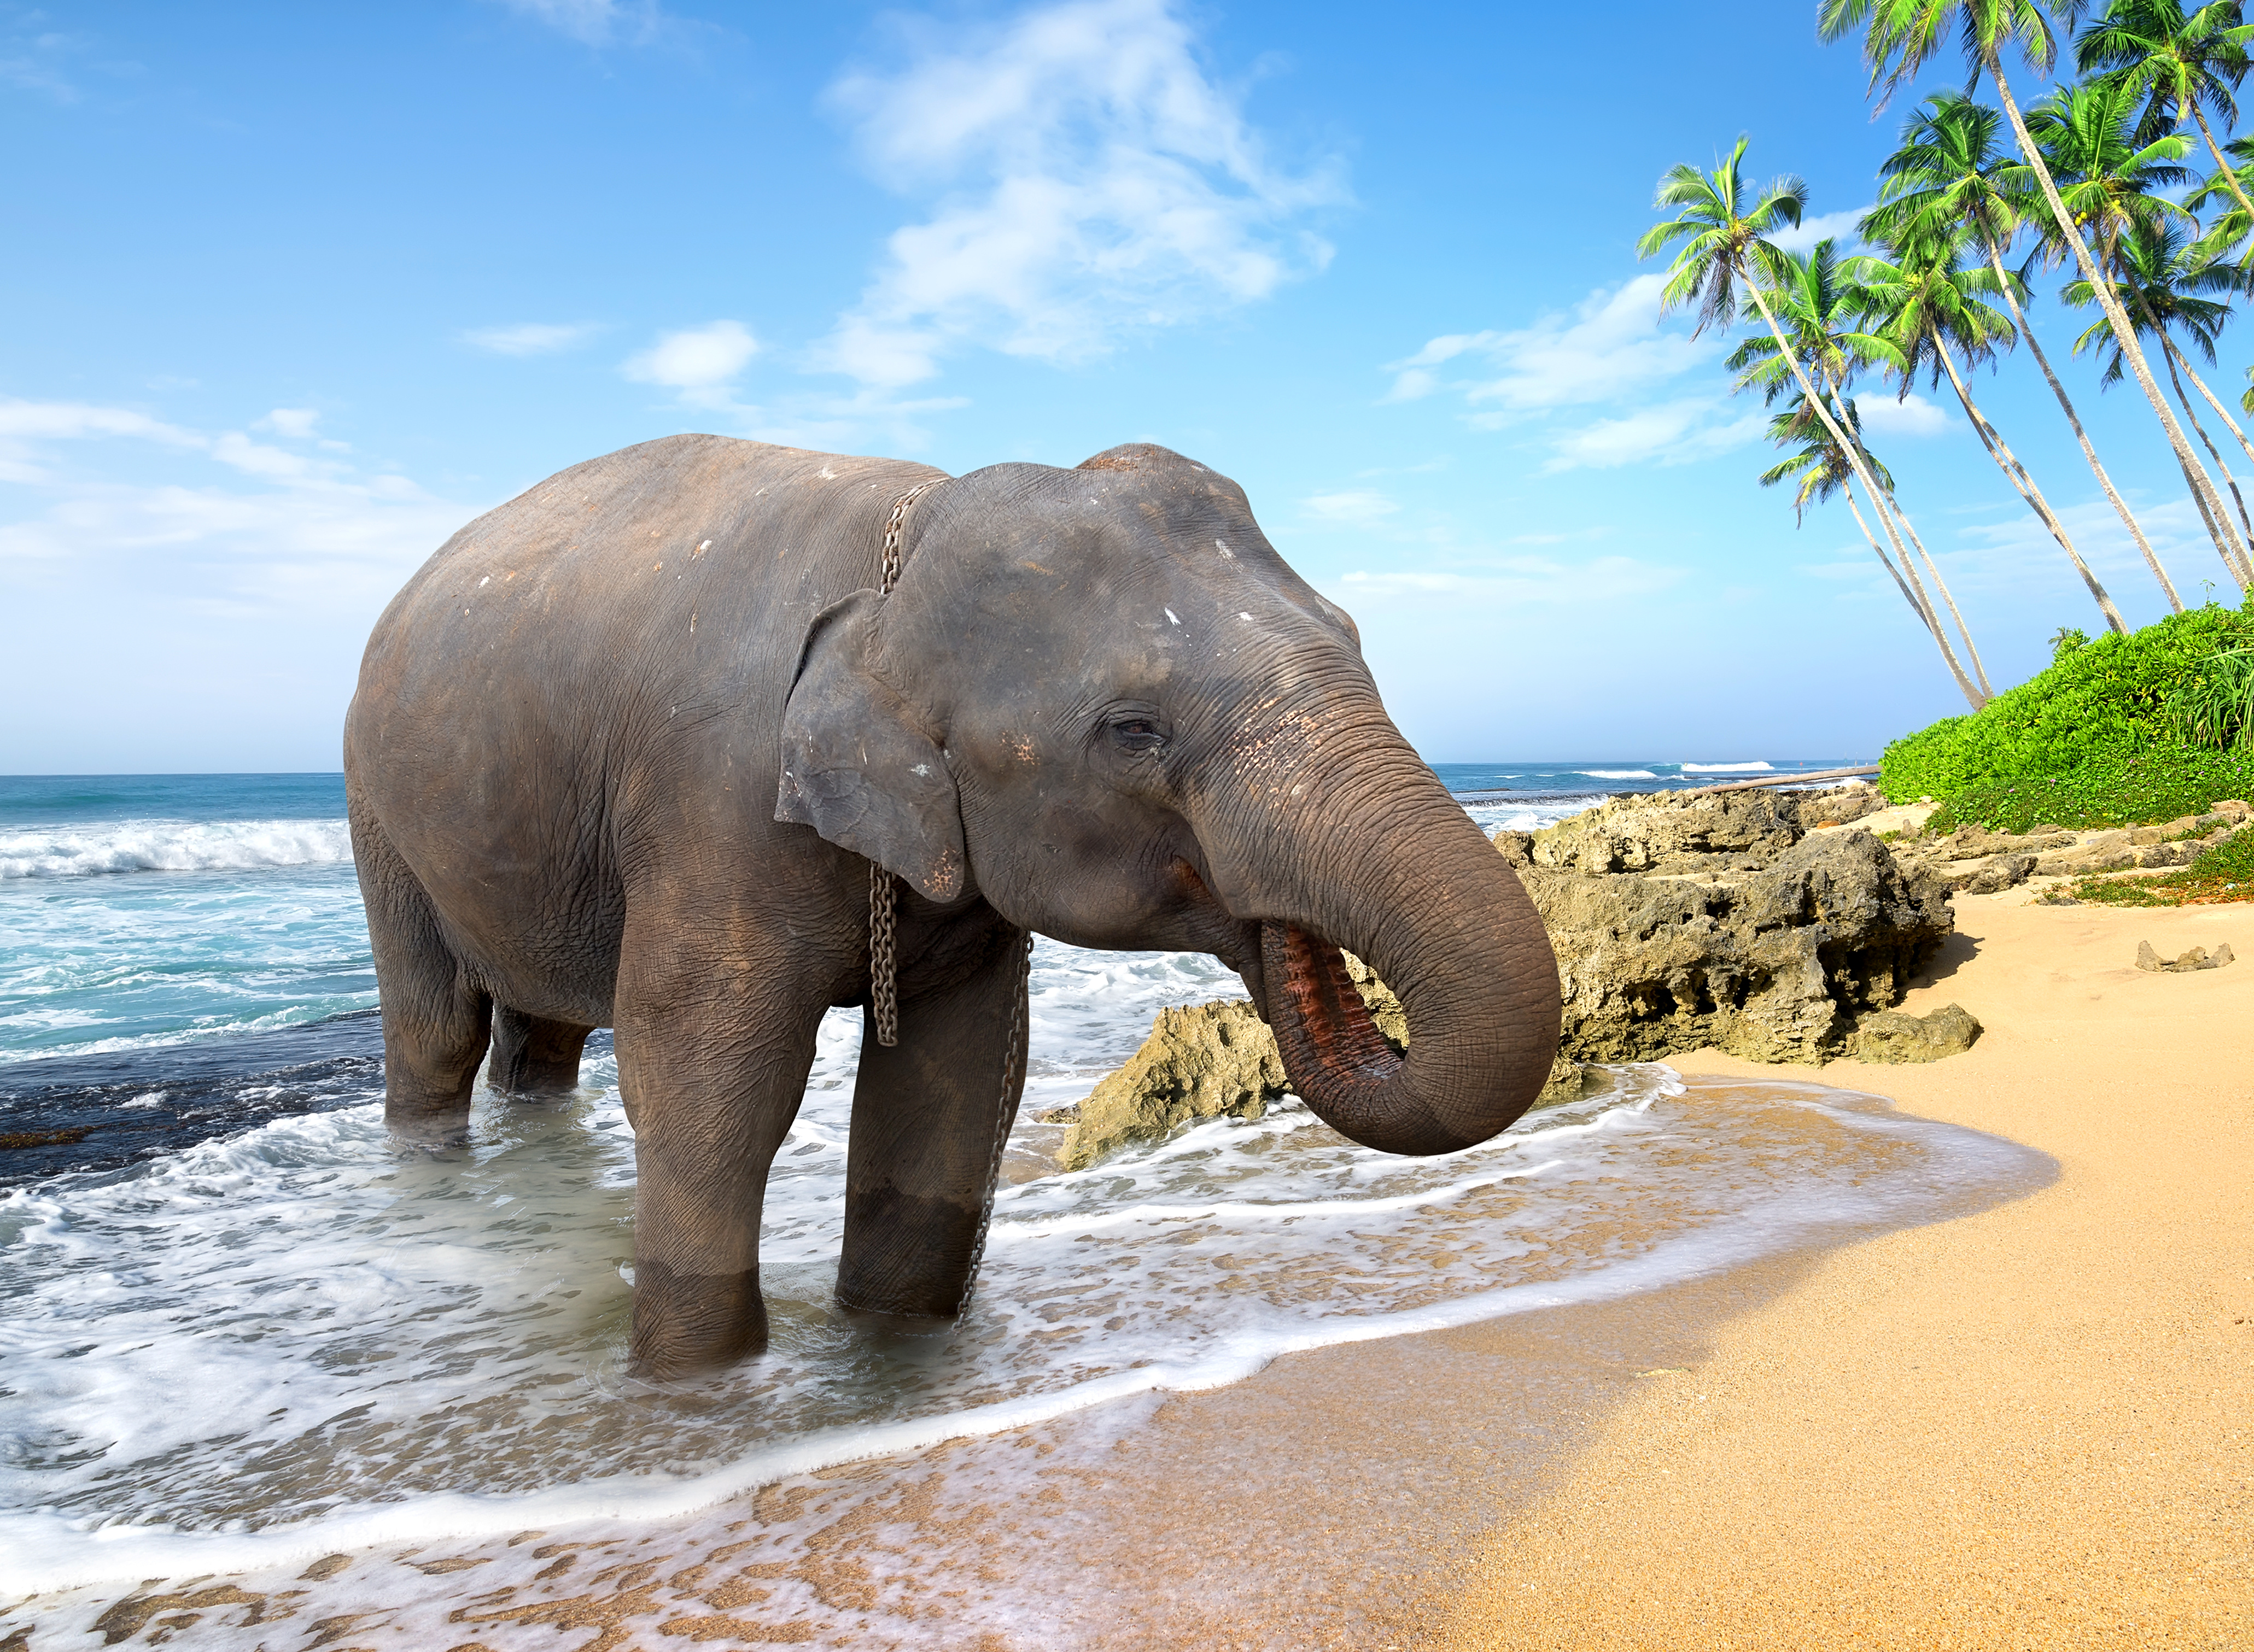 Elephant 4k Ultra HD Wallpaper   Background Image ...